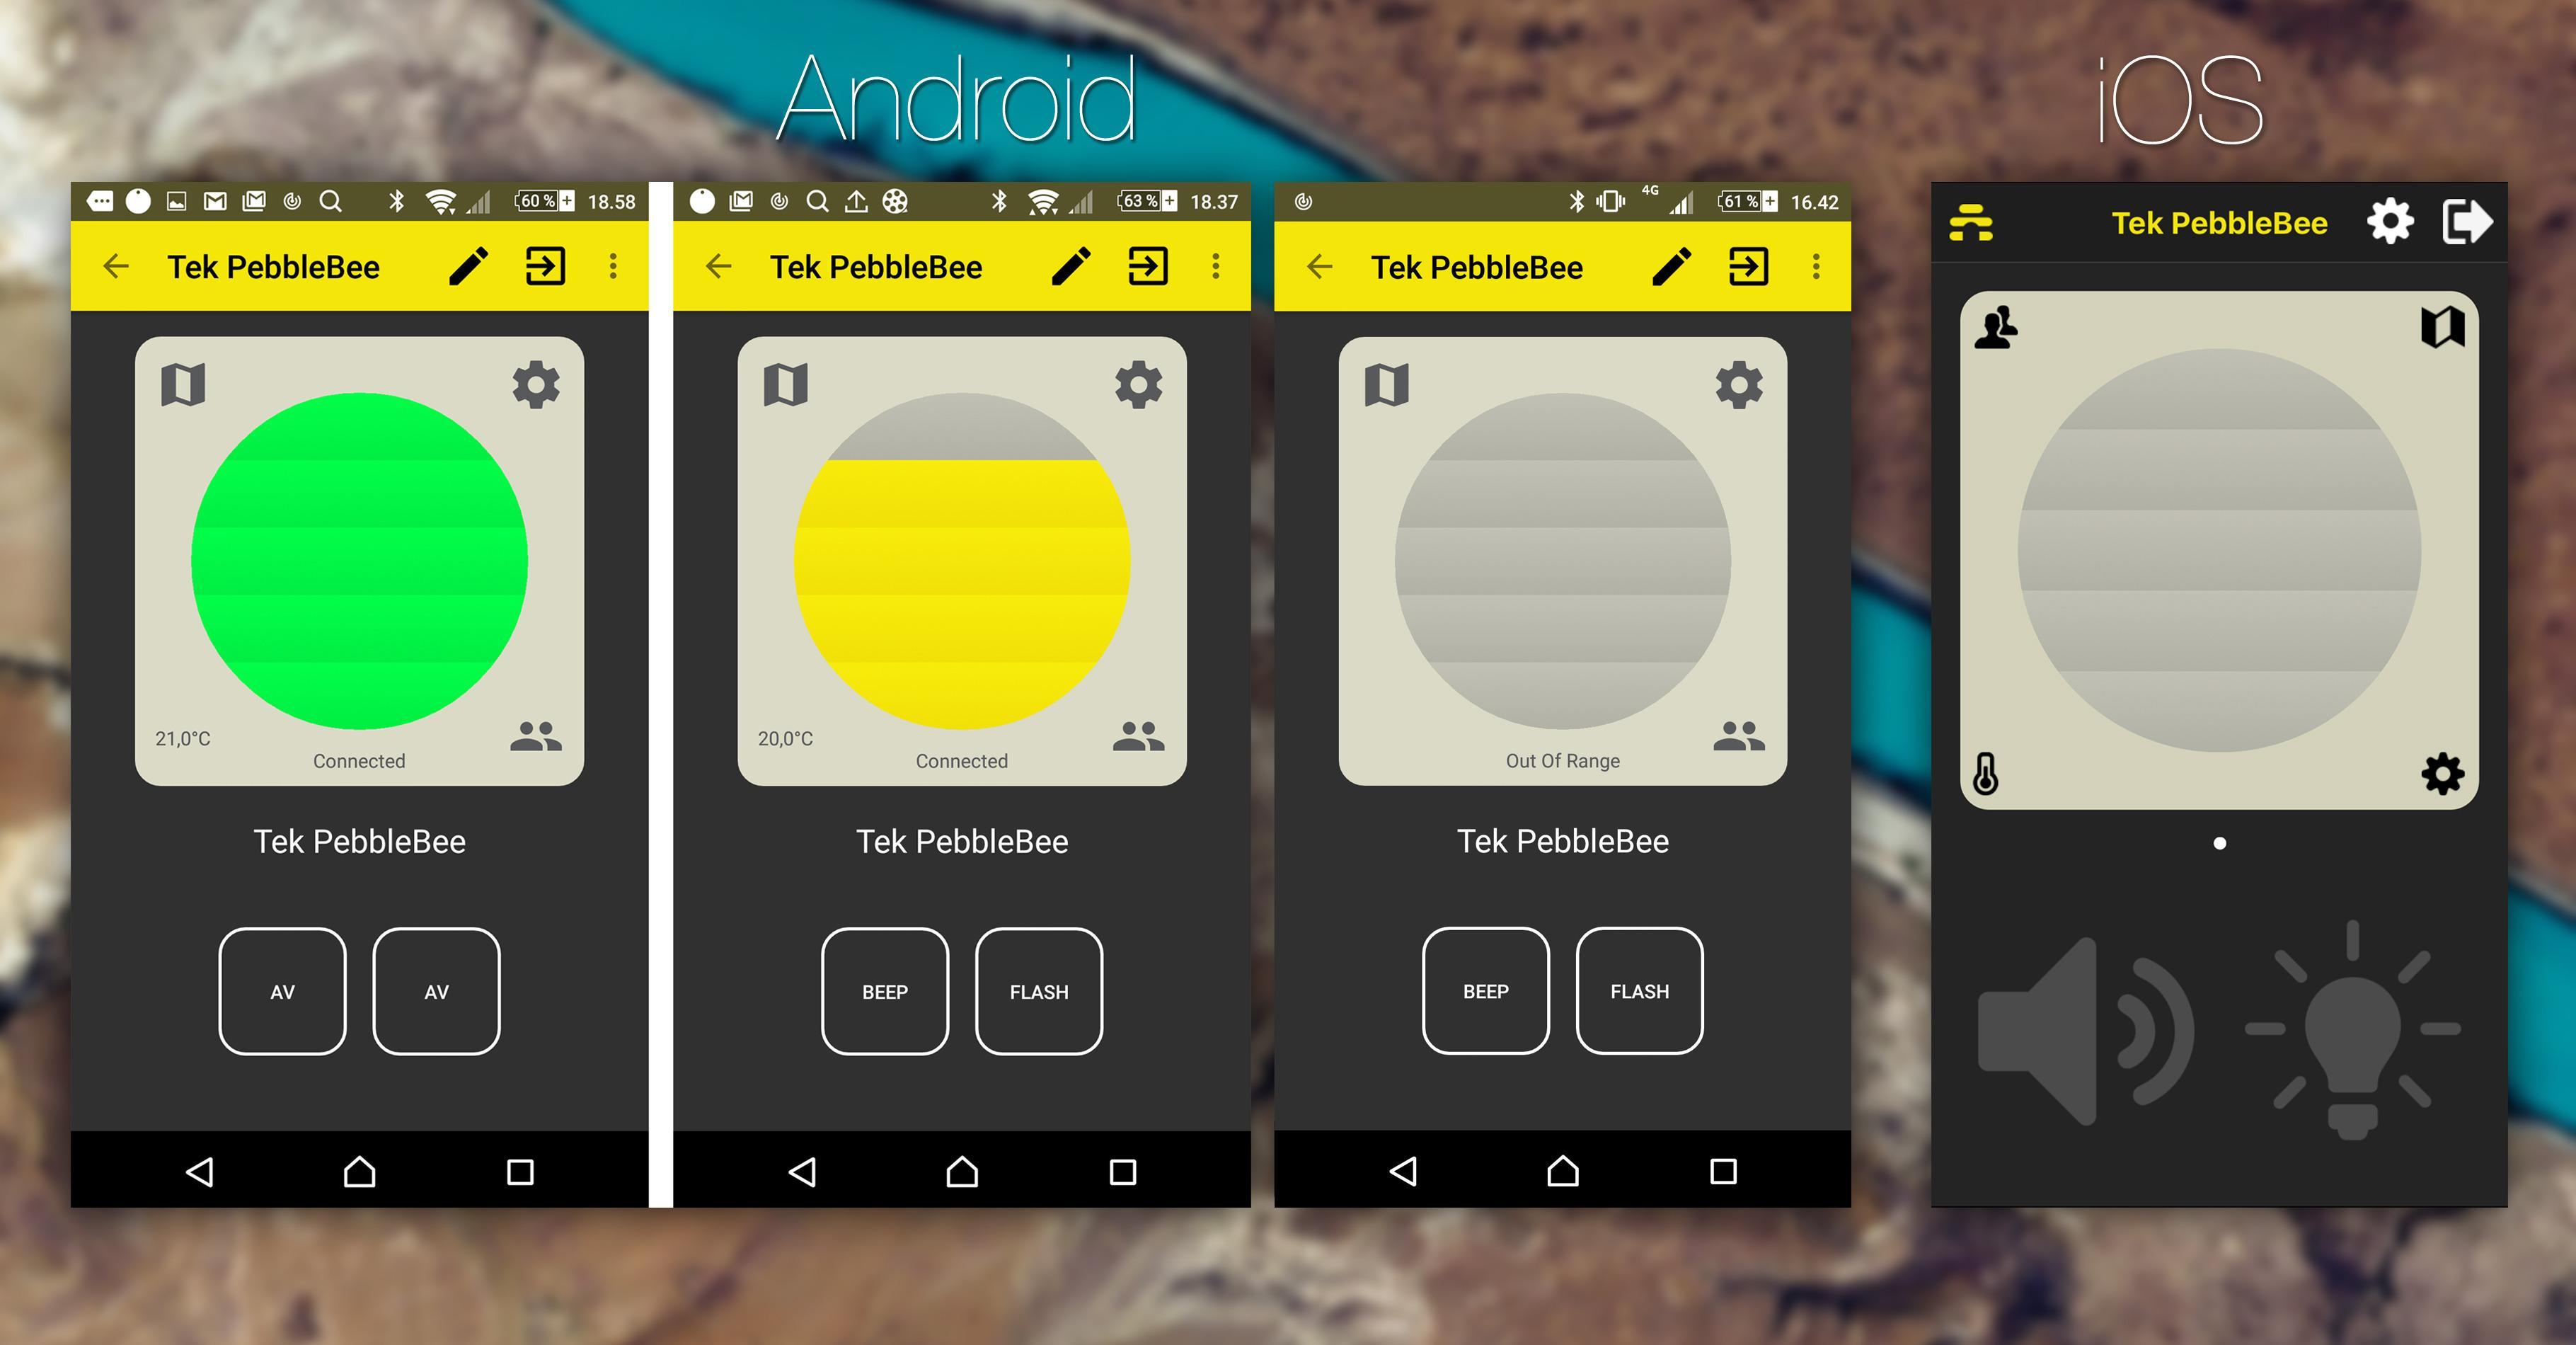 Pebblebee Hives radar skifter farge ettersom brikken er langt unna eller nærme telefonen.